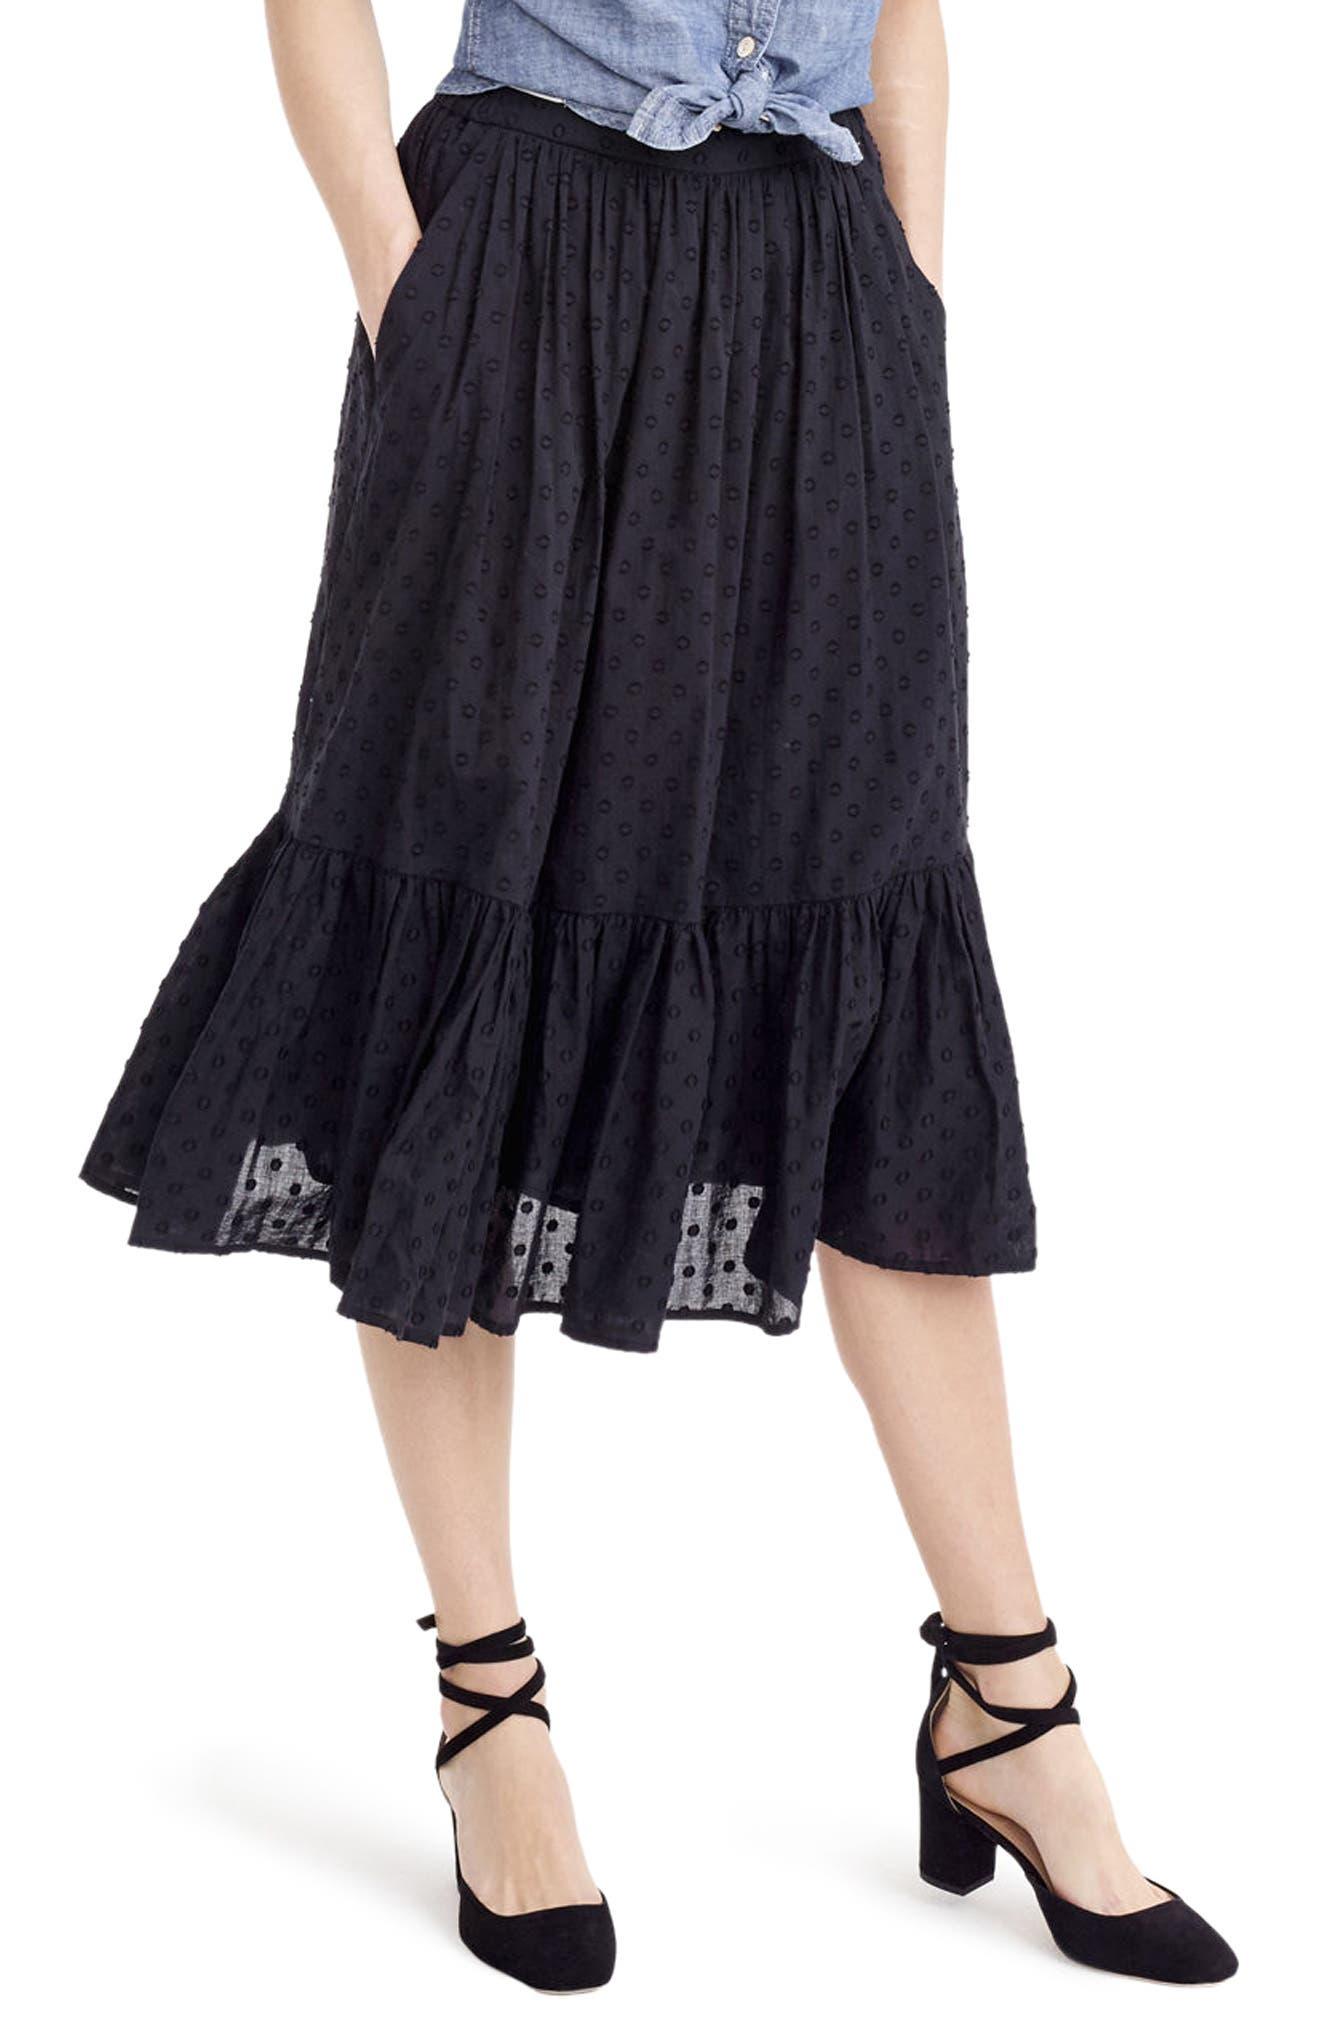 Main Image - J.Crew Baluster Clip Dot Skirt (Regular & Petite)